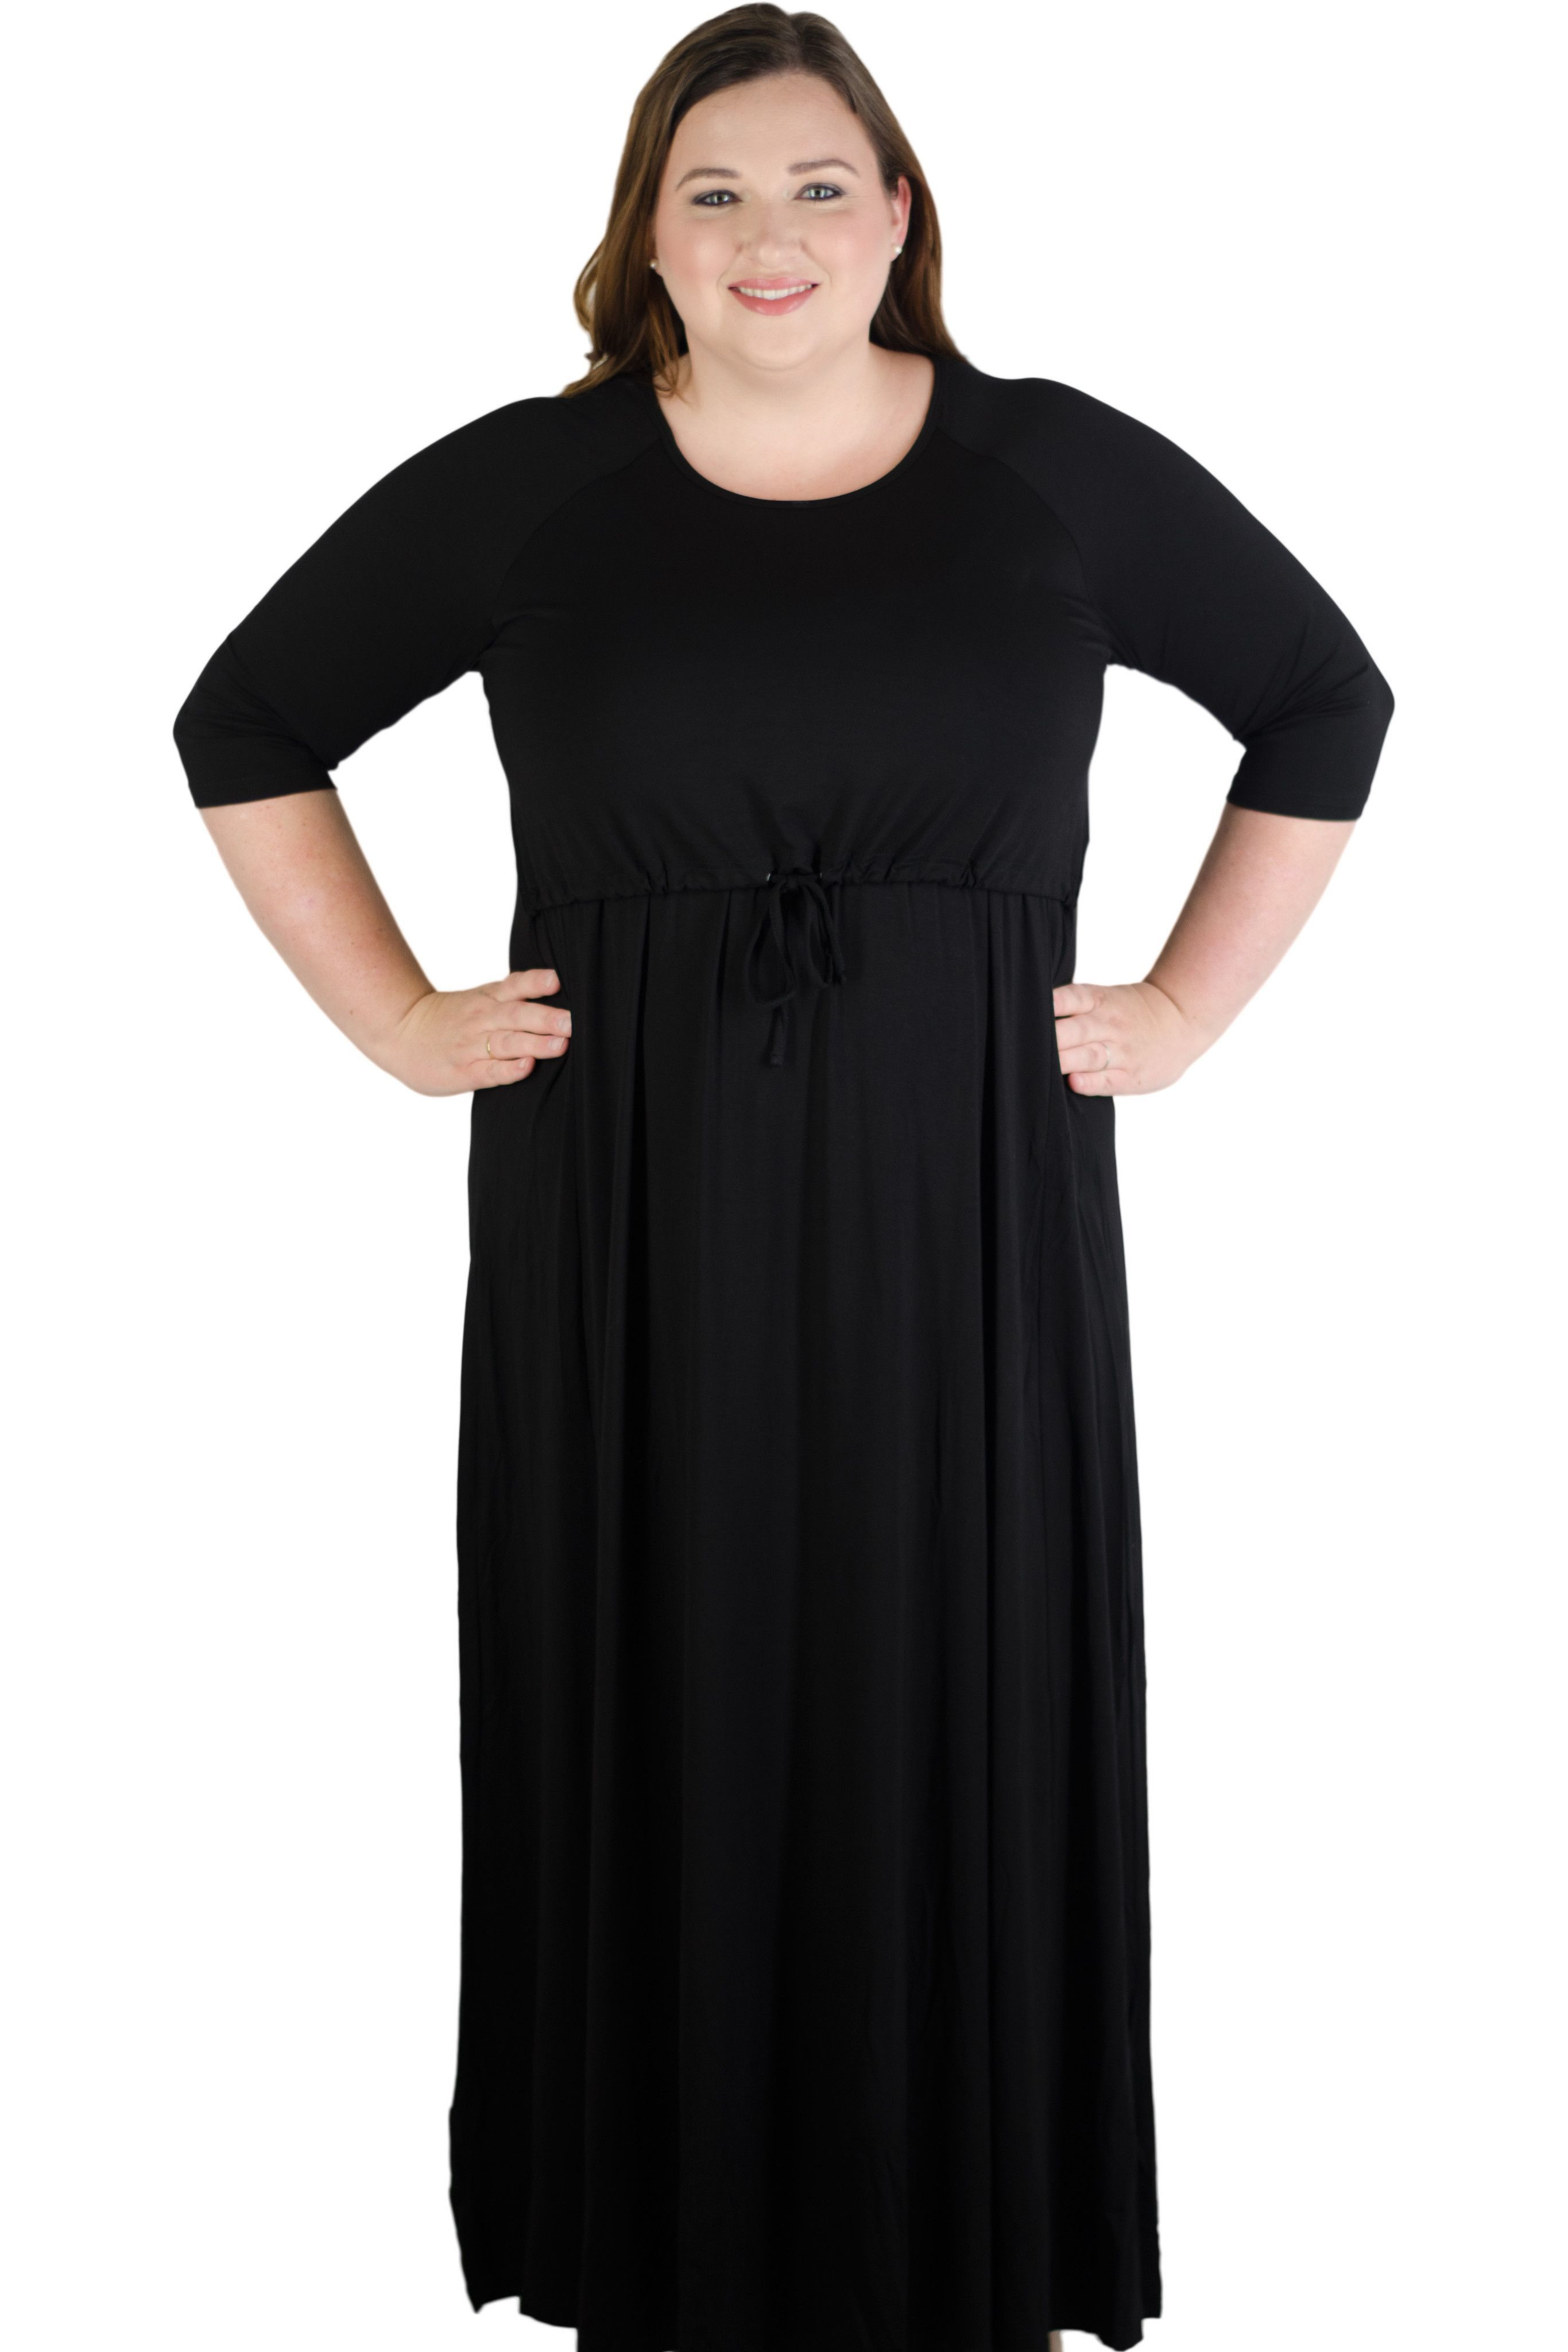 8bec817bb149d5 Latched Mama Plus 3/4 Sleeve Drawstring Maxi Dress | Nursing ...